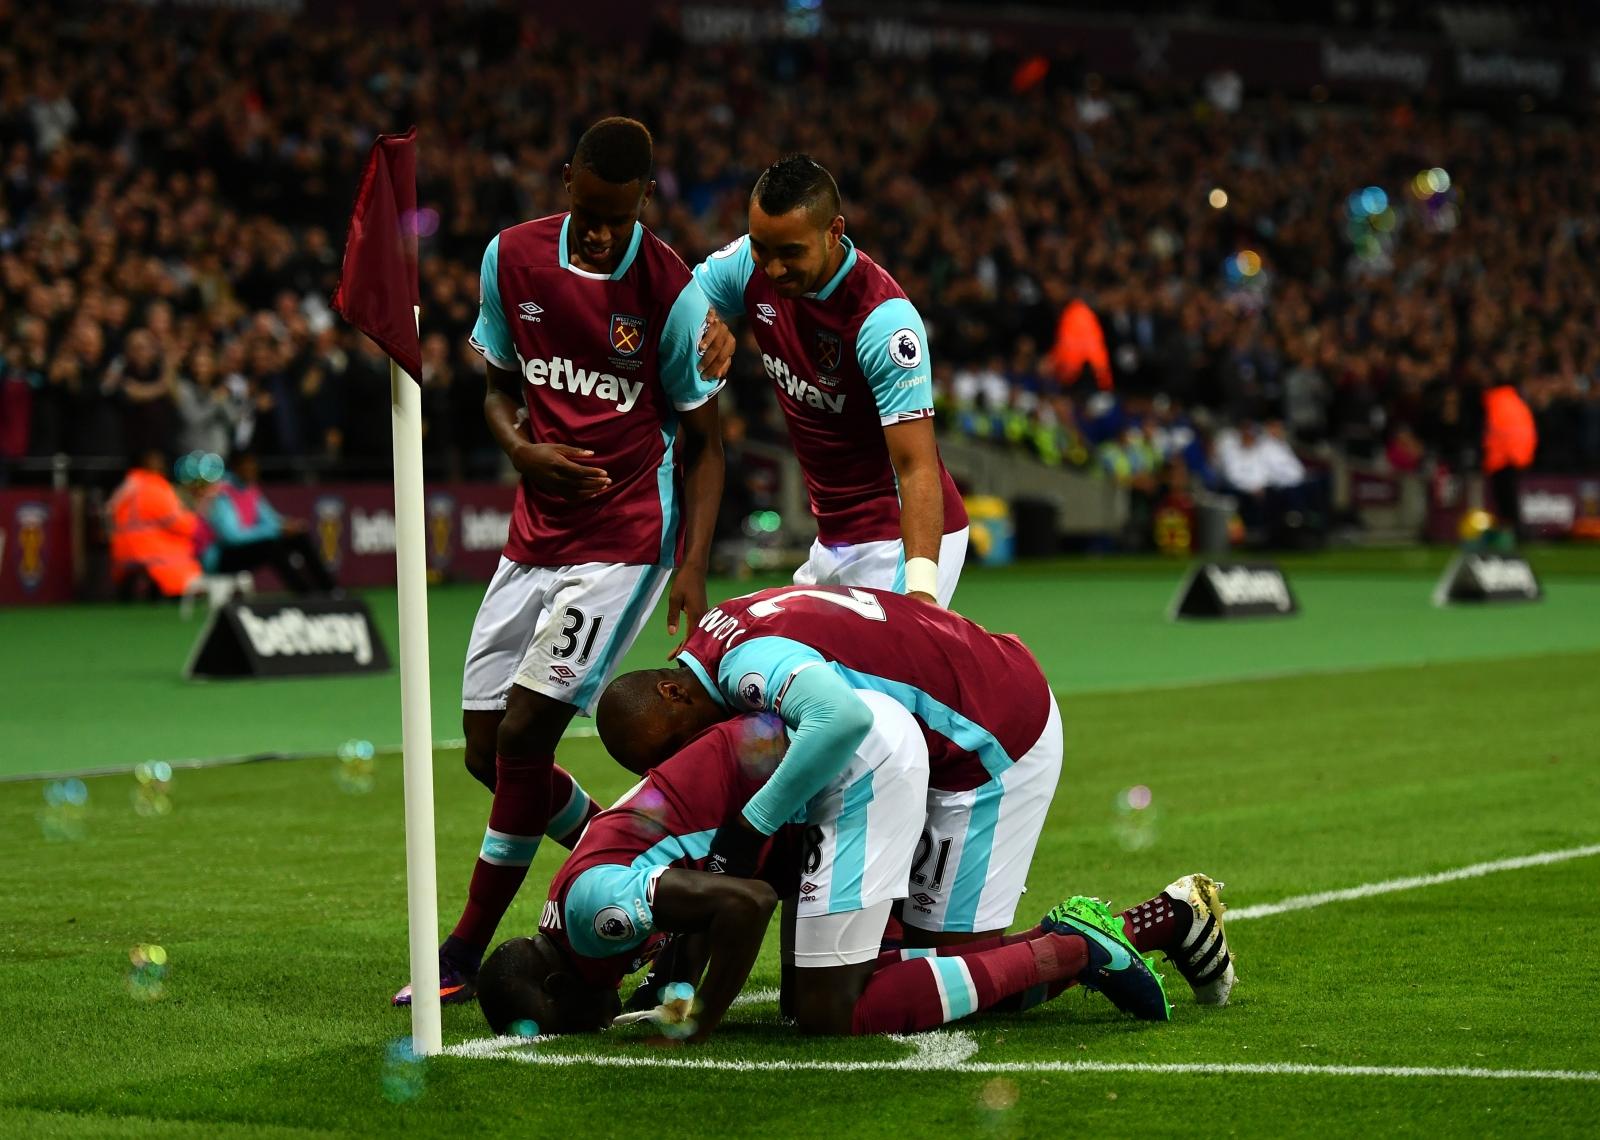 West Ham celebrate their goal